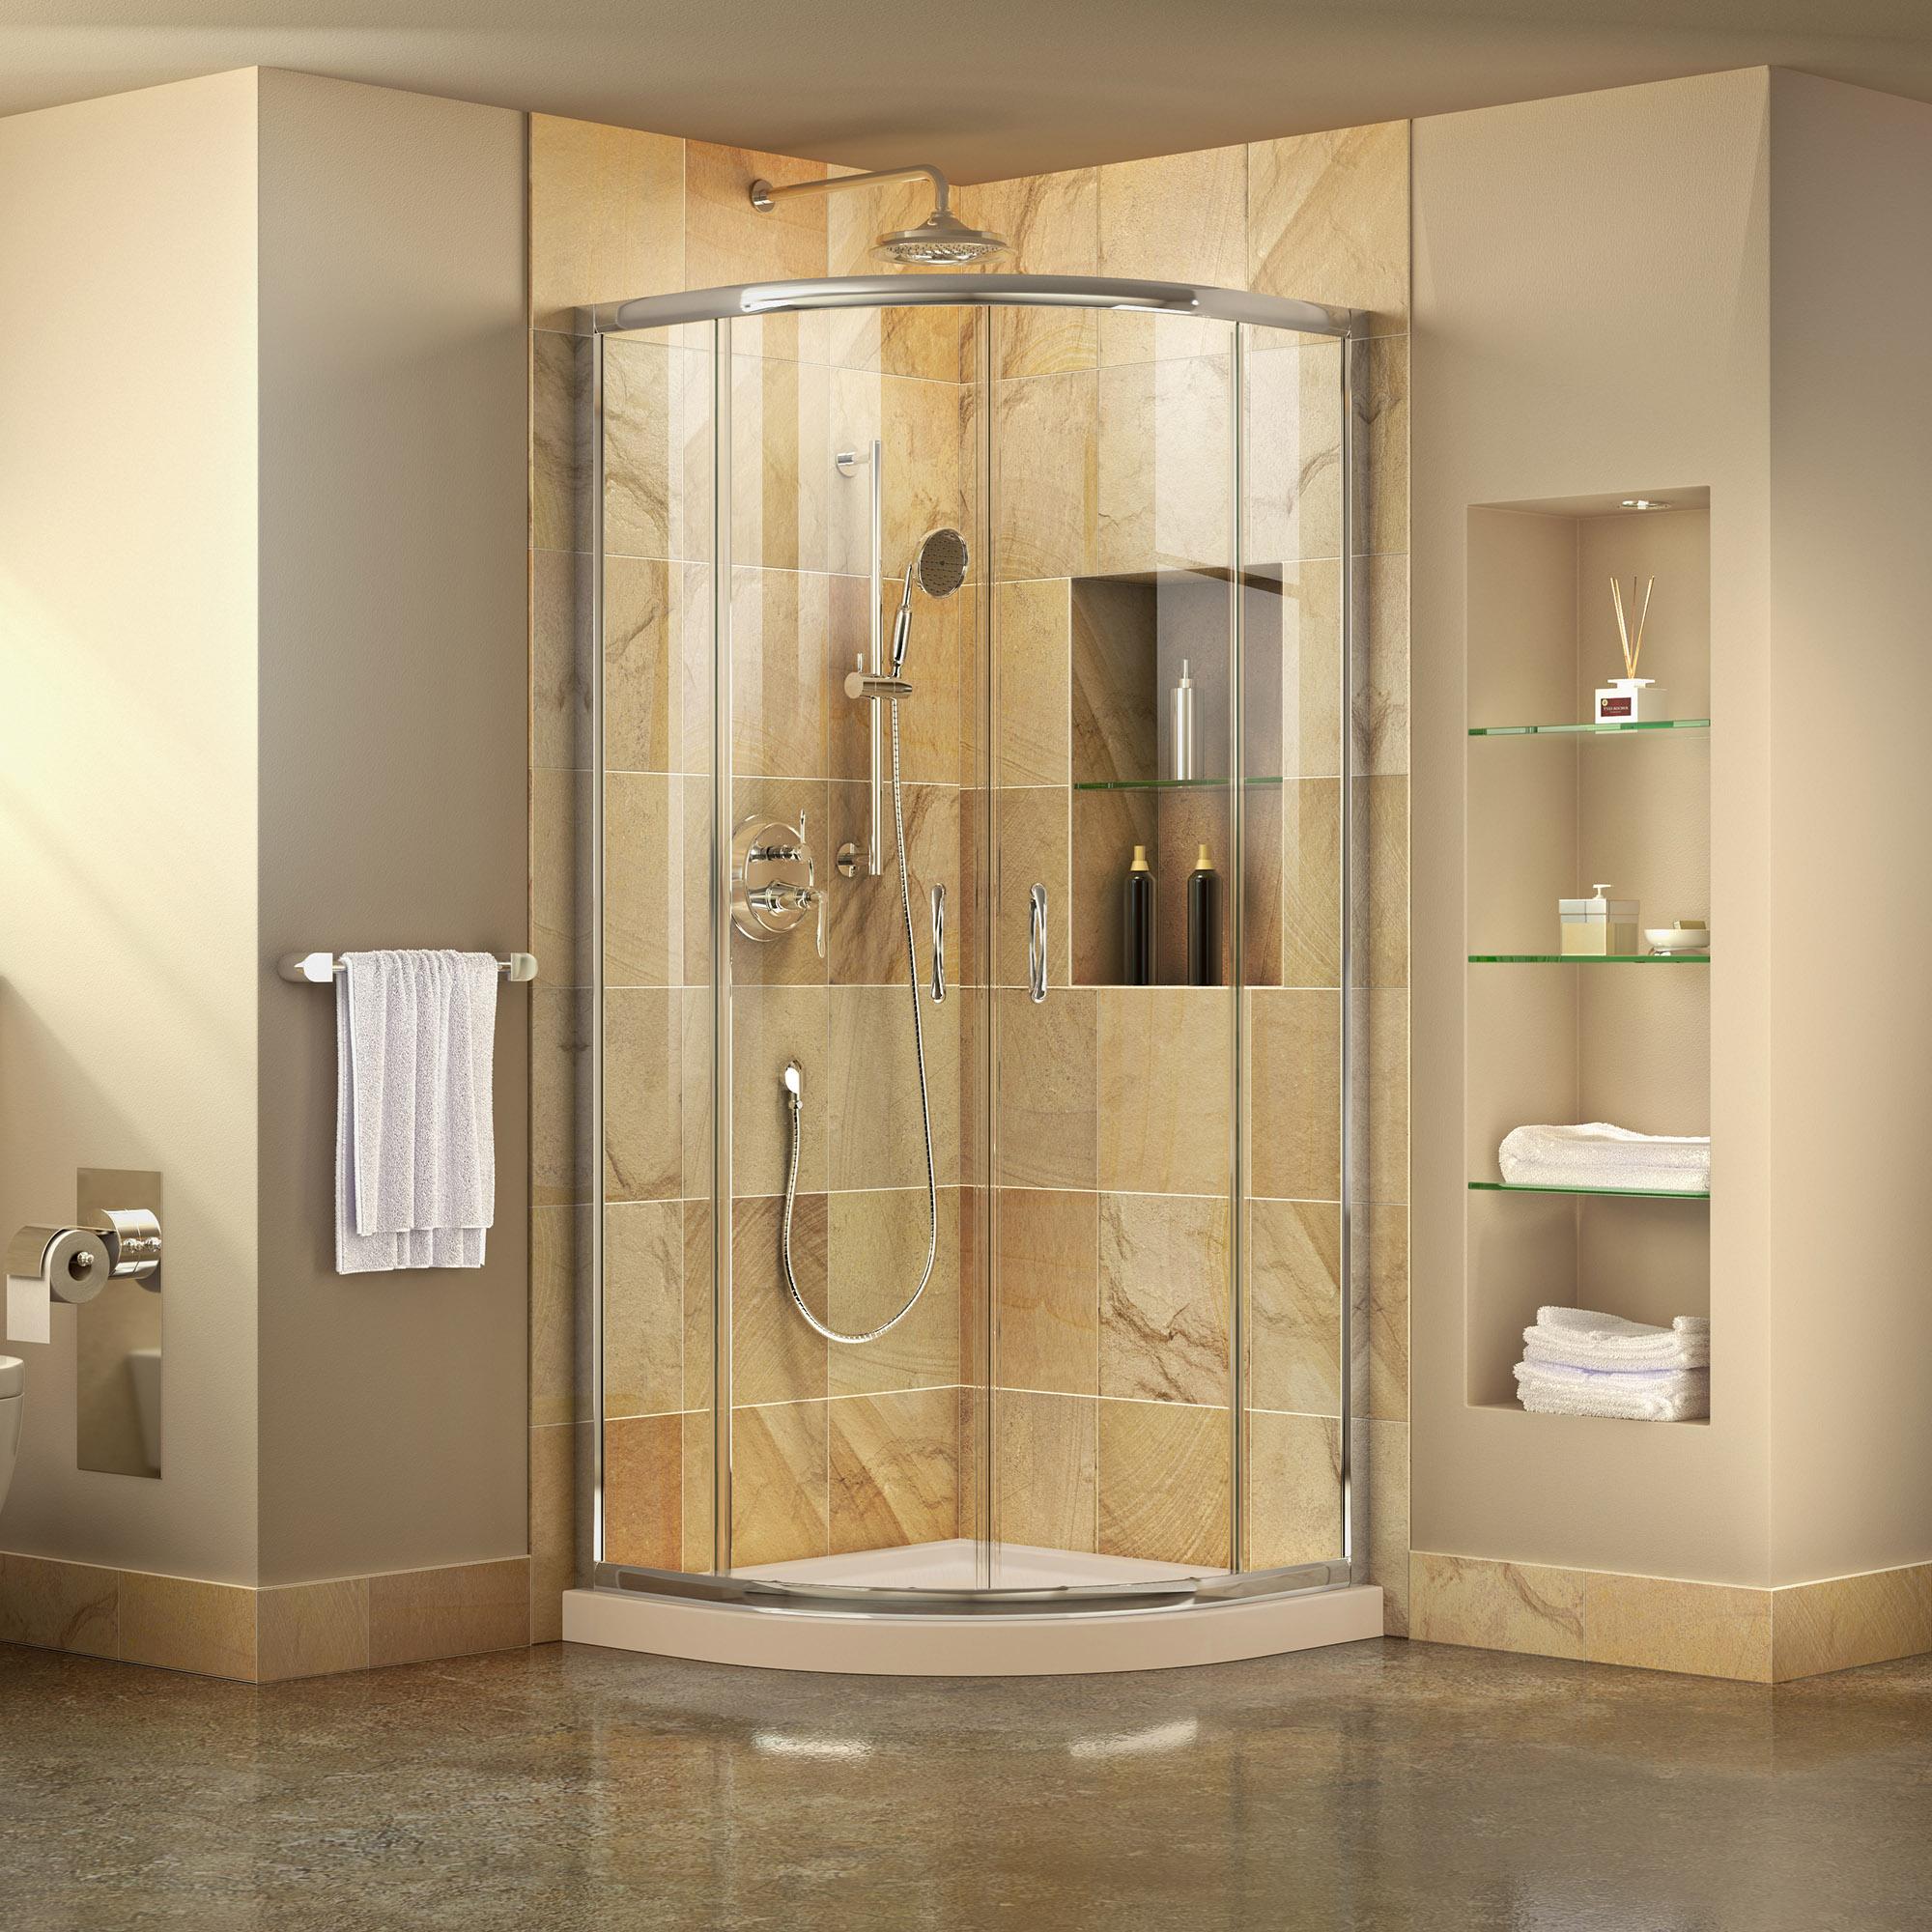 "Prime Frameless Sliding Shower Enclosure & SlimLine 38"" by 38"" Quarter Round Shower Tray"